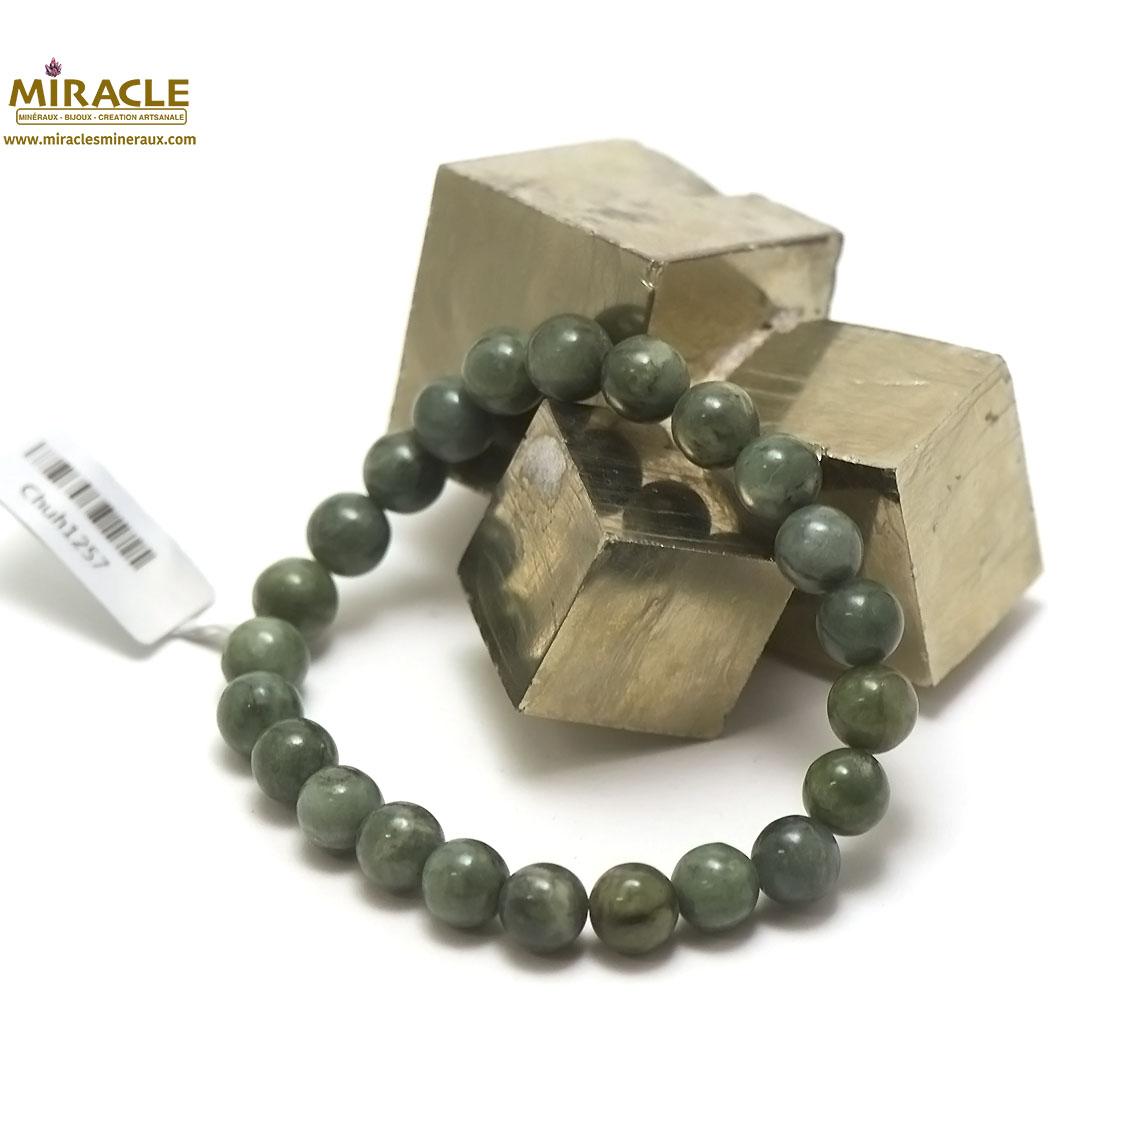 Bracelet jade néphrite de Canada, perle ronde 8 mm